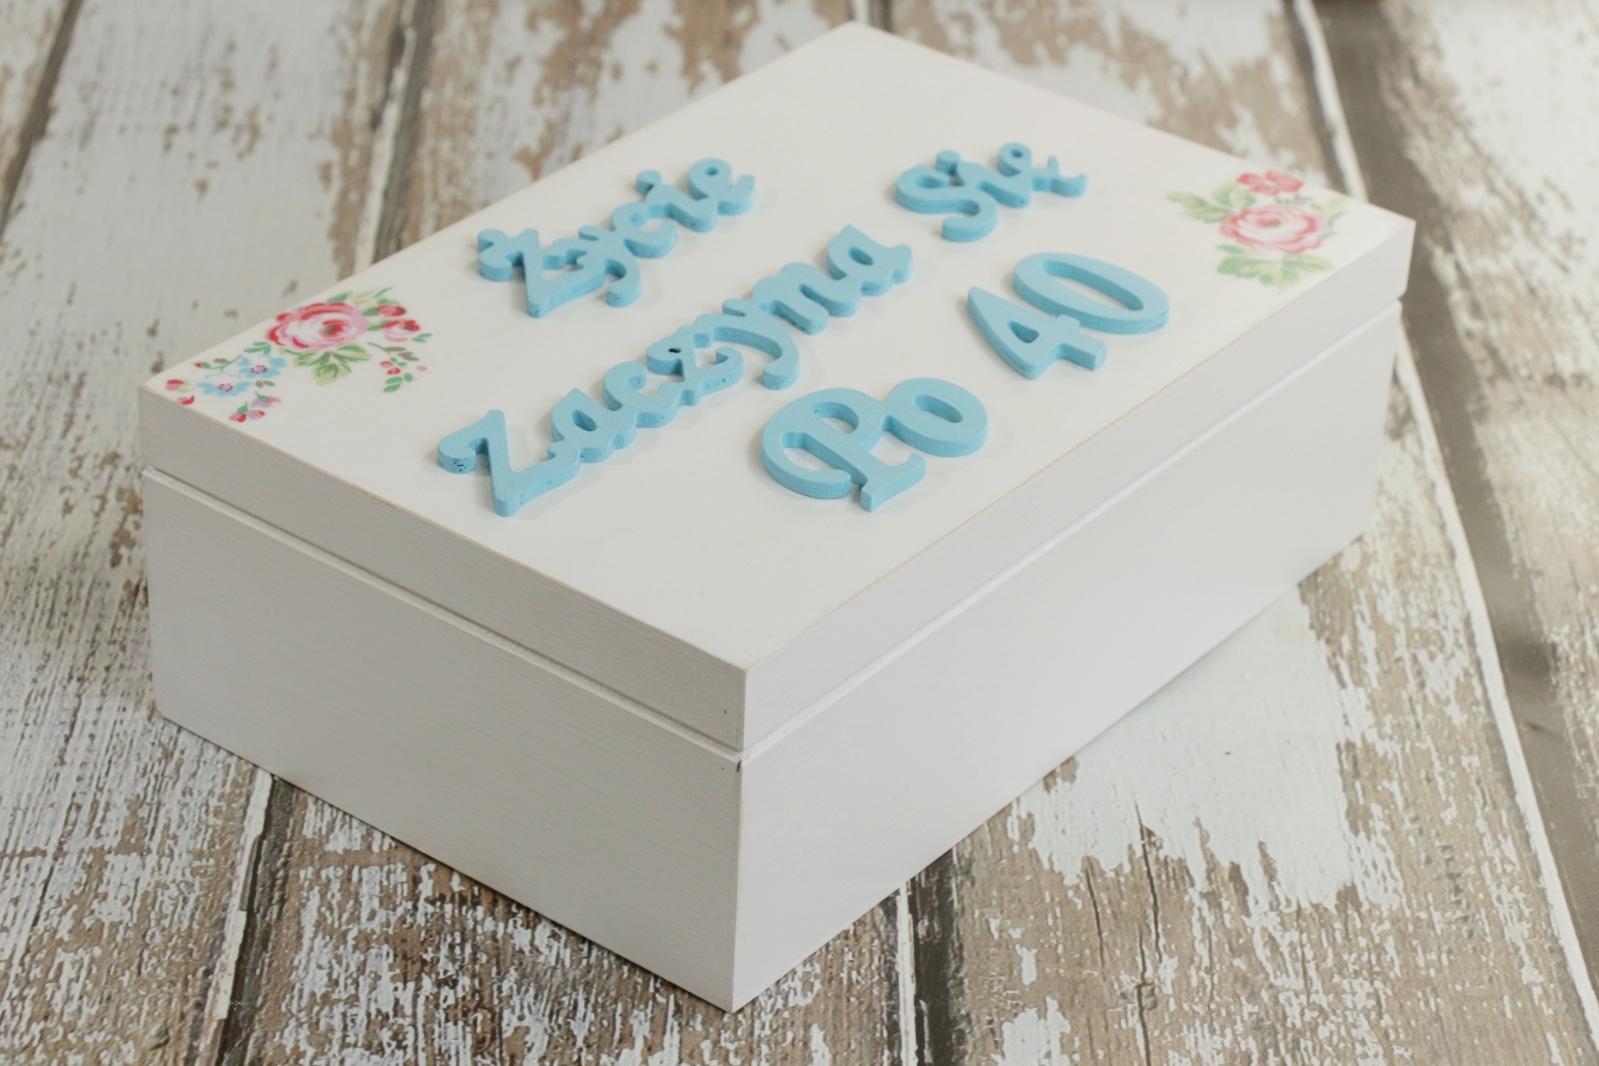 Inne rodzaje Joanna Design: Pudełko urodzinowe KJ11